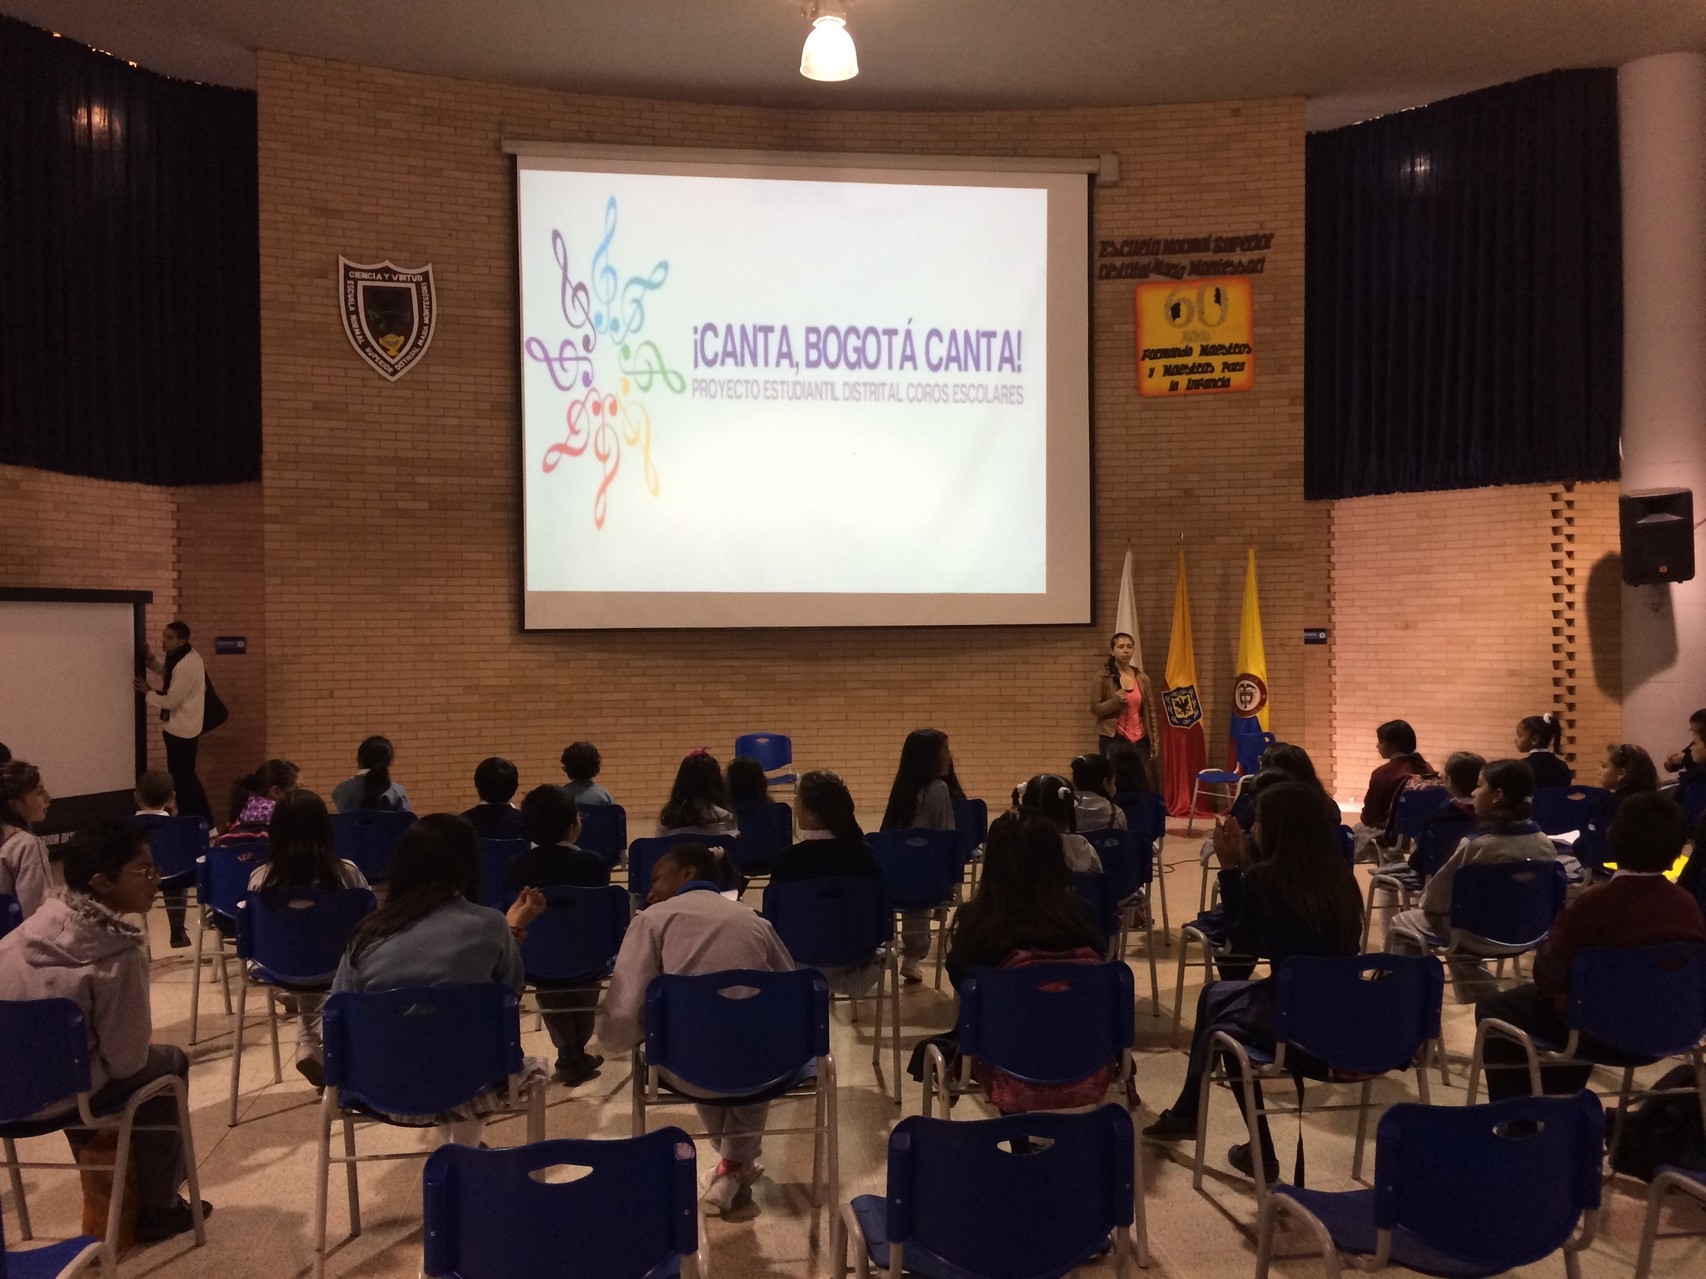 Ensayo ¡Canta Bogotá Canta! Junio 03 de 2014 Escuela Normal Superior Distrital Maria Montessori Sede A